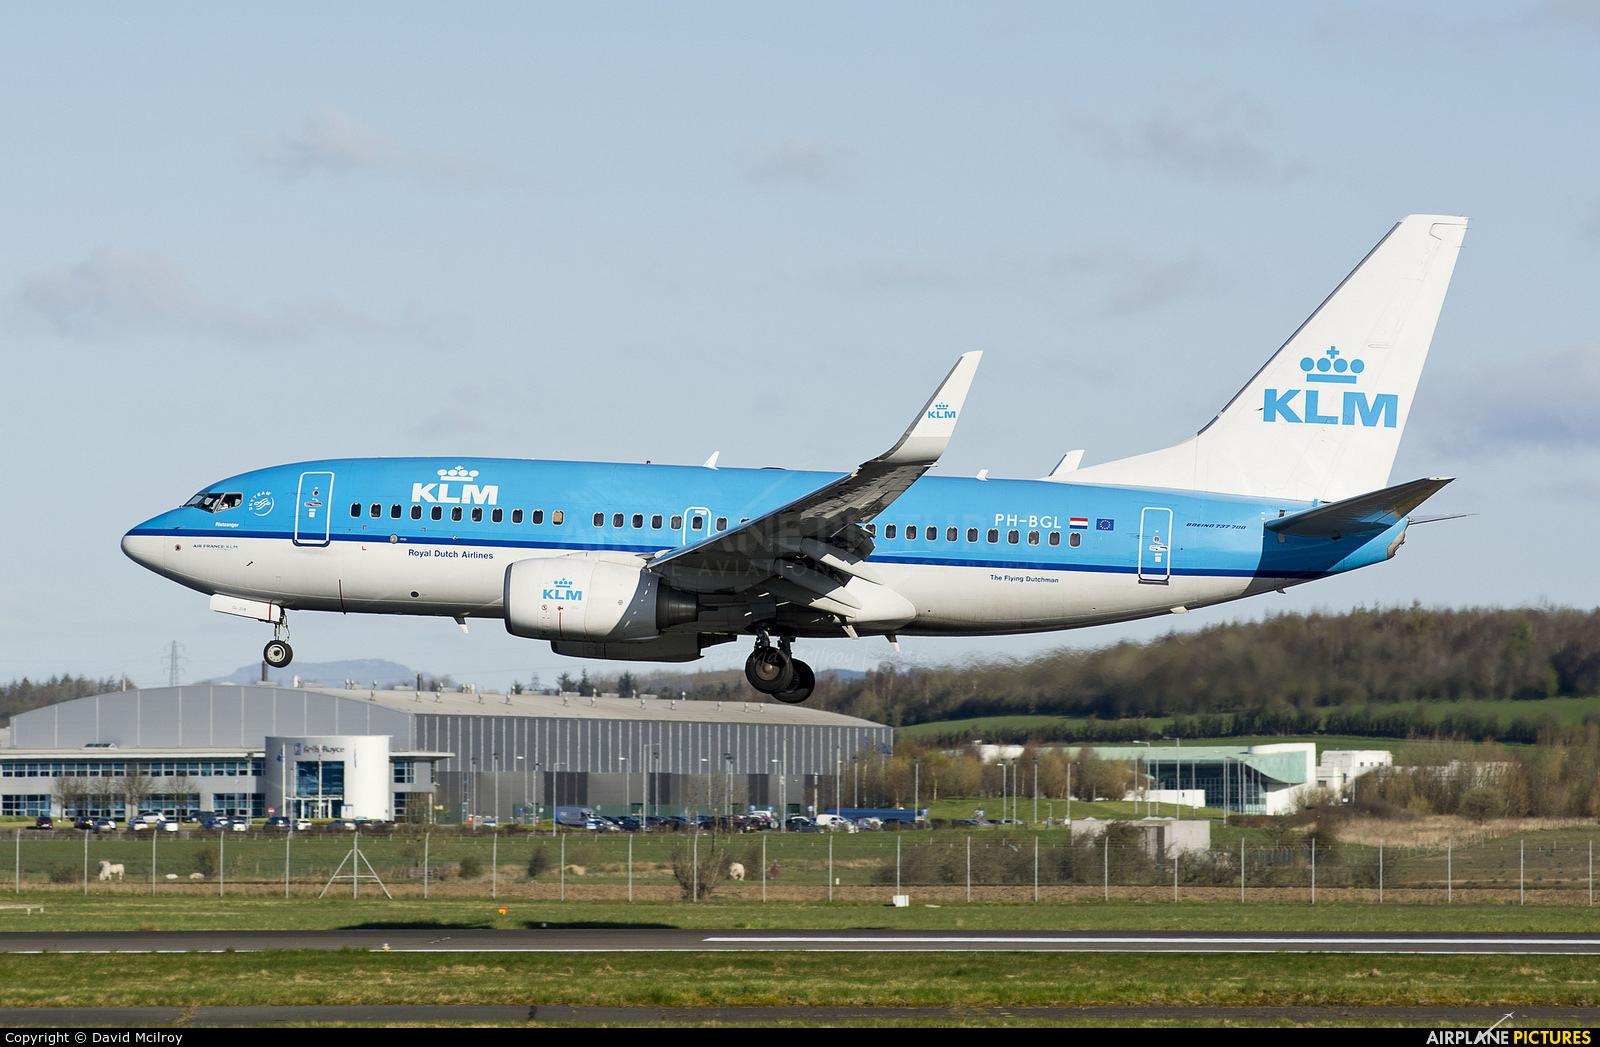 KLM PH-BGL aircraft at Glasgow